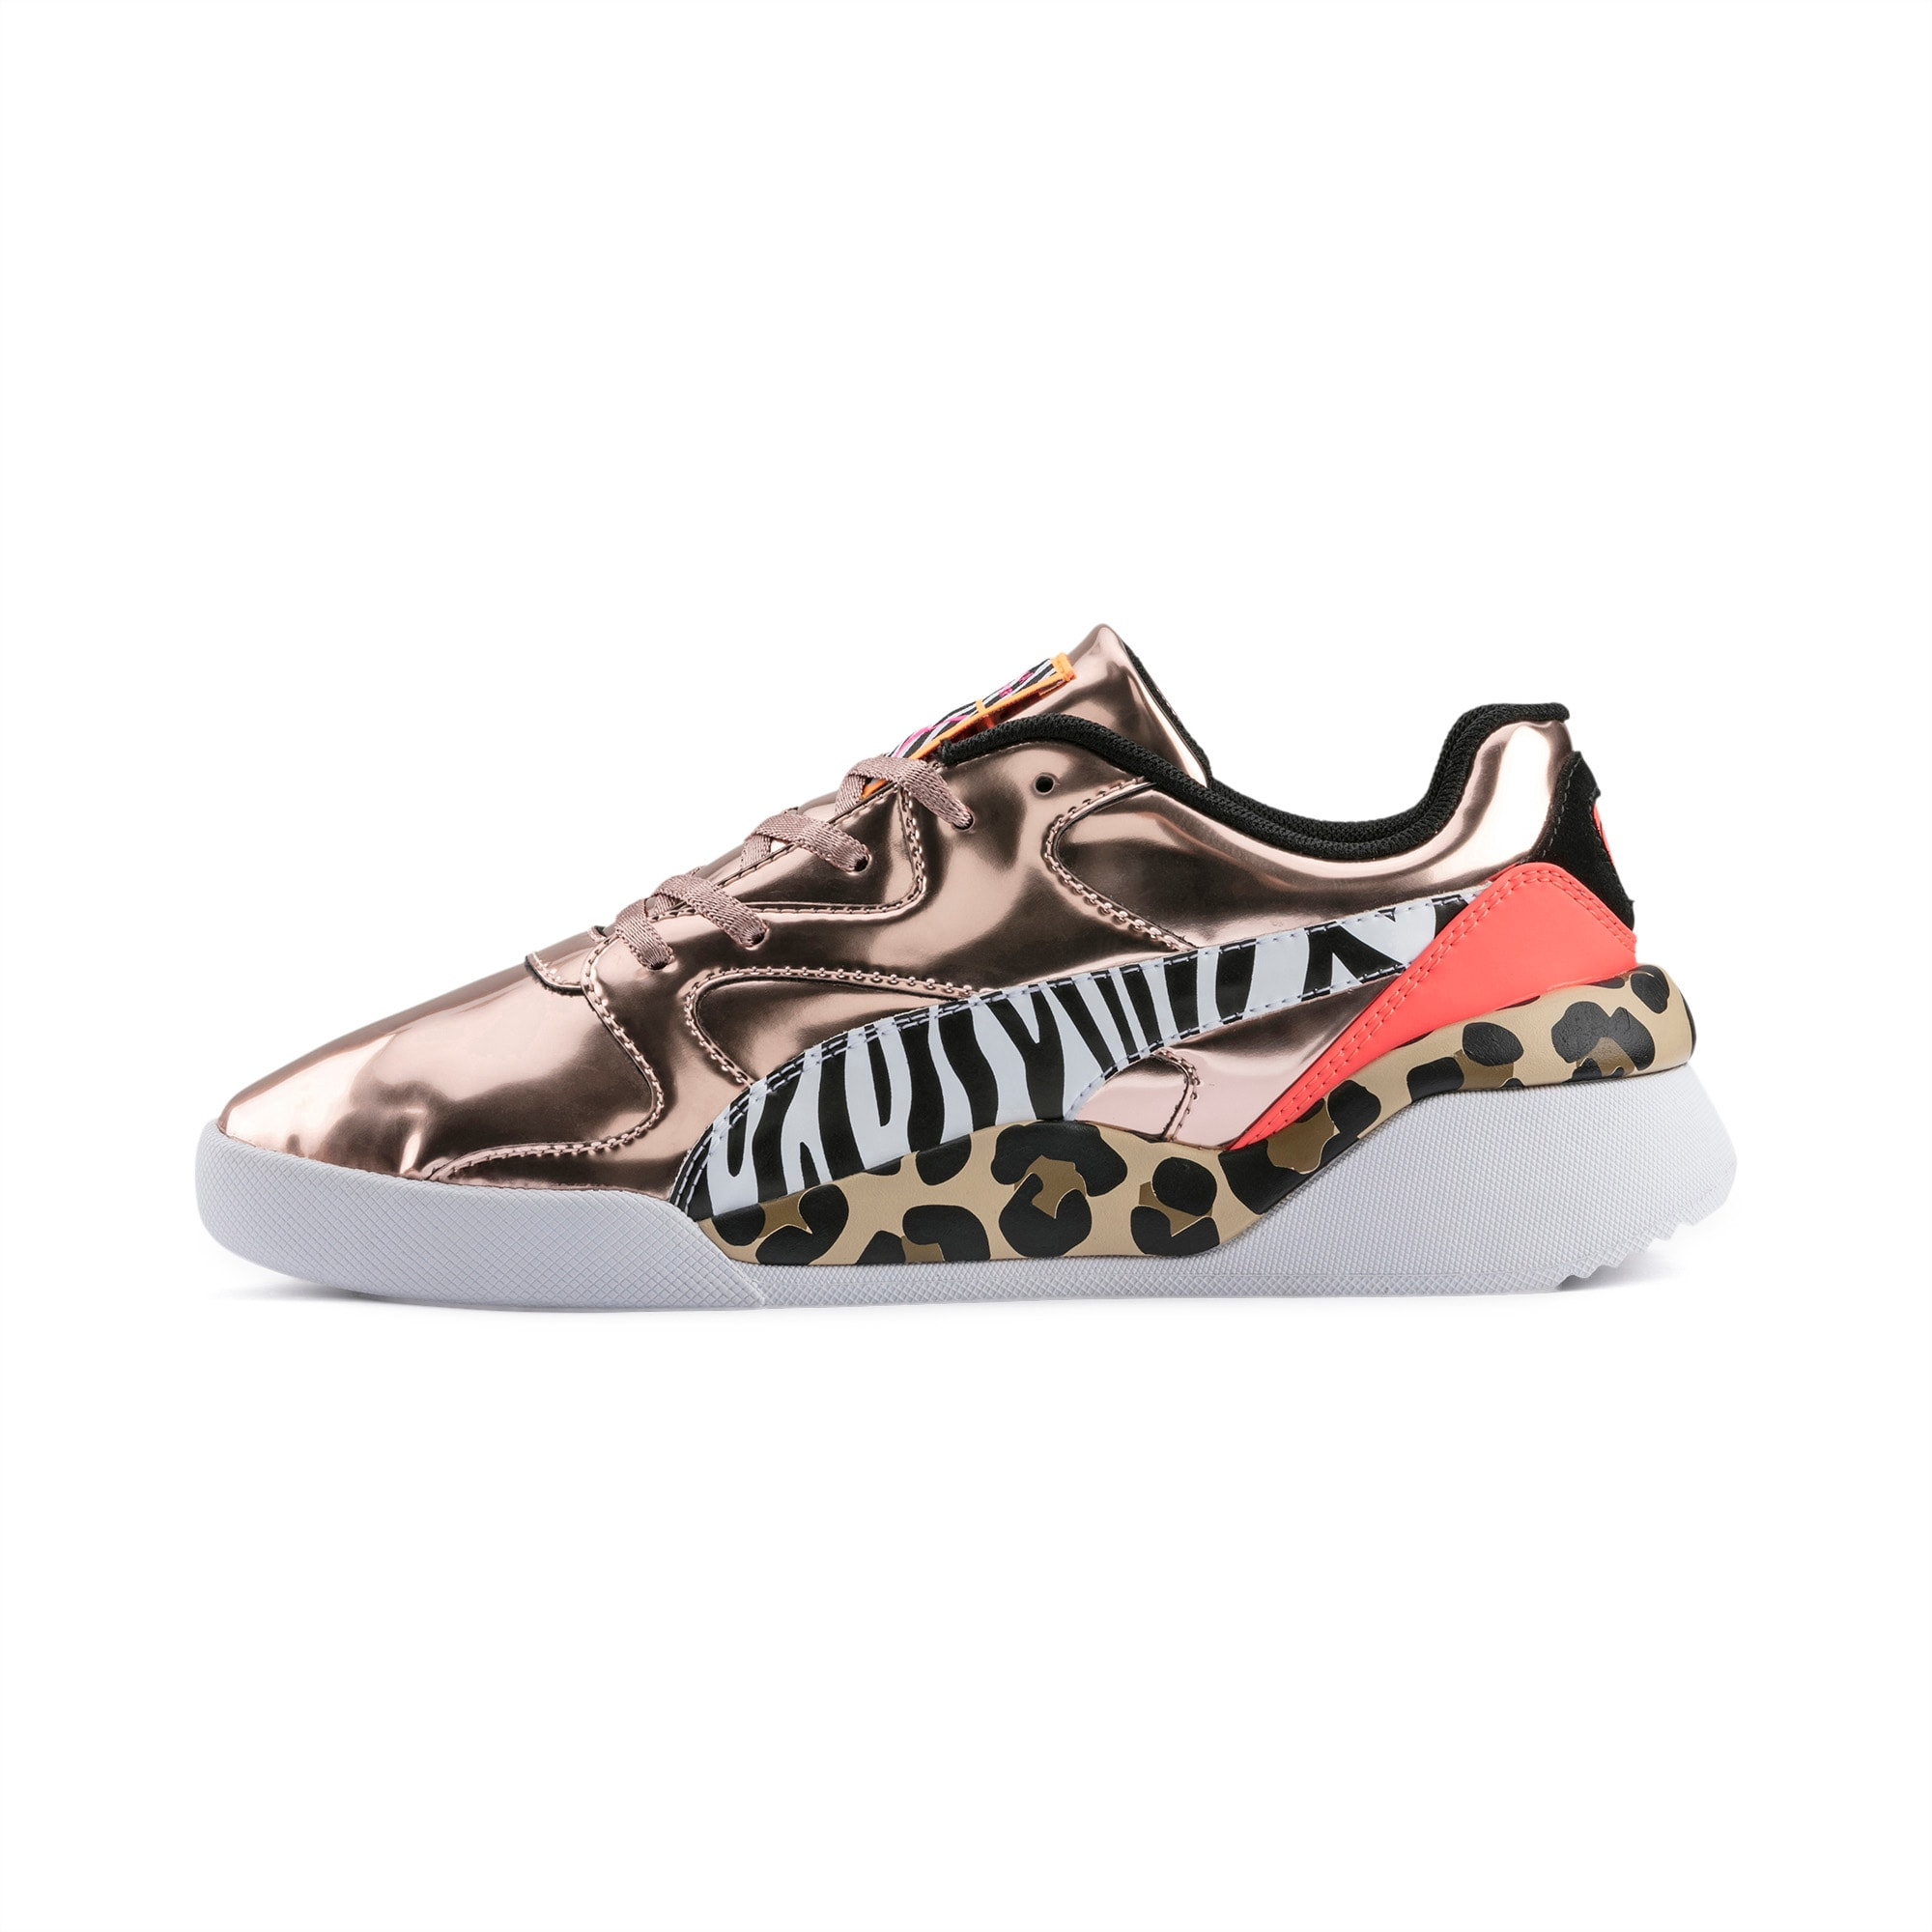 Womens PUMA Sneakers | Womens PUMA Shoes |